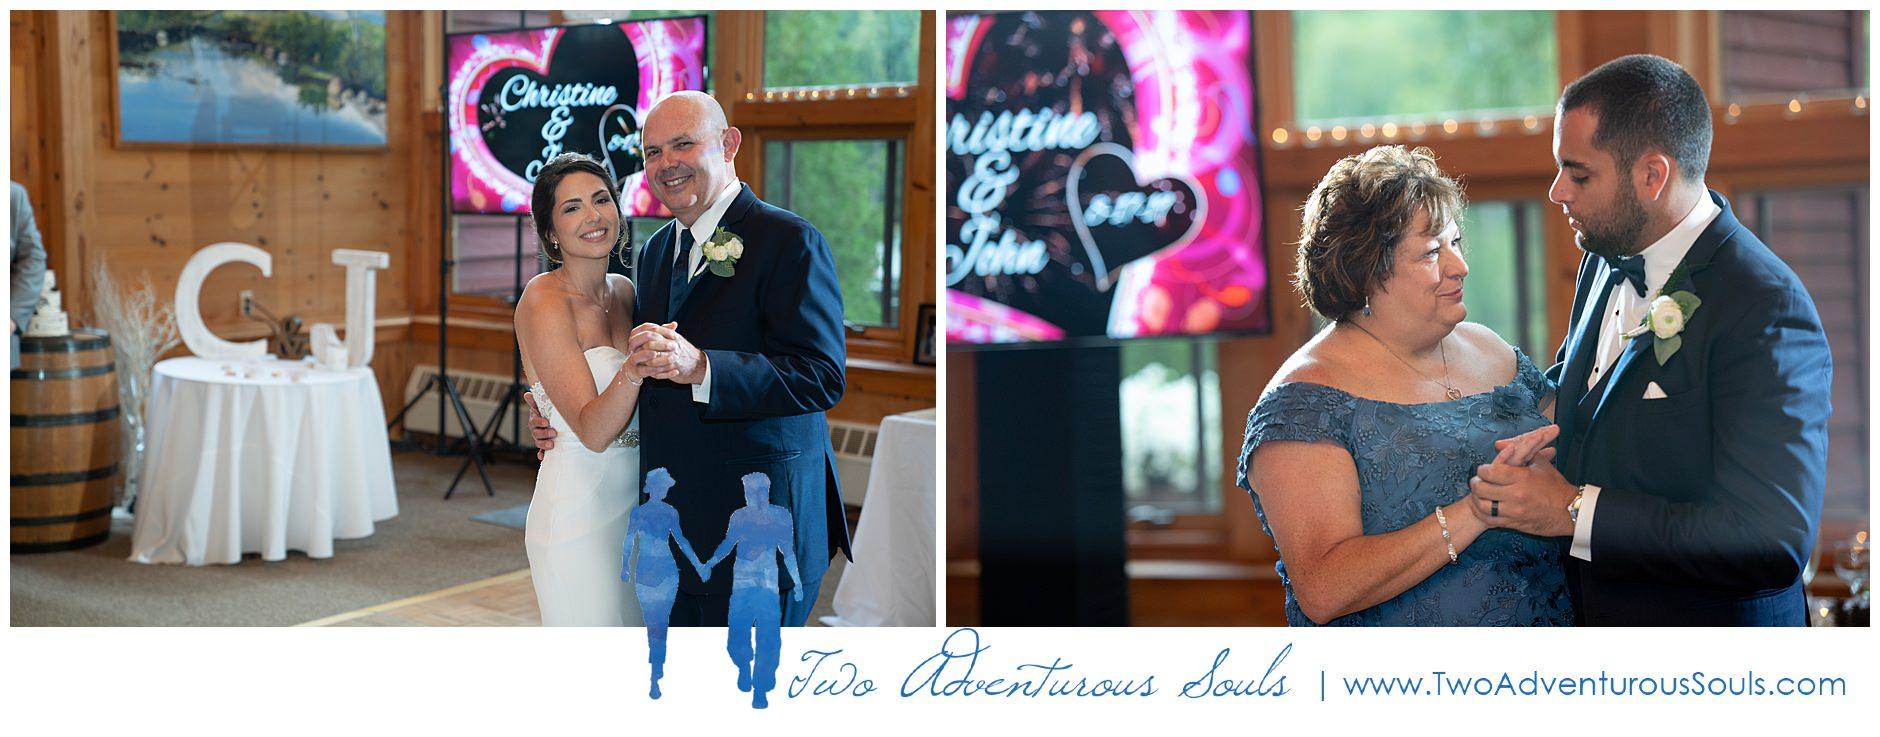 Sugarloaf Outdoor Center Wedding Photographers, Destination Wedding Photographers, Two Adventurous Souls-081719_0055.jpg